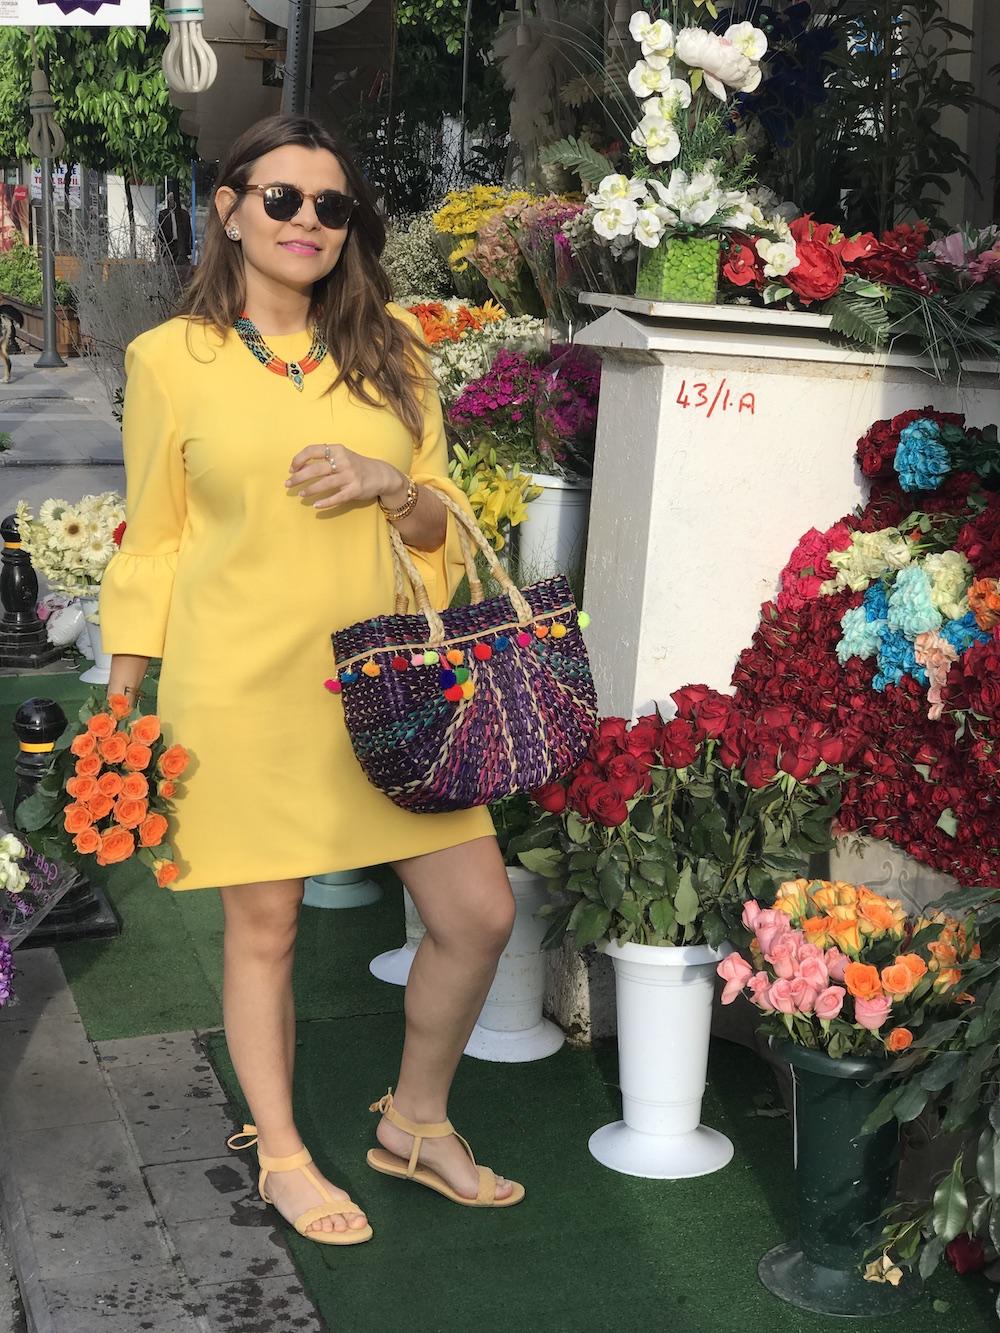 blogger-style-with-flowers-alley-girl-betul-yildiz